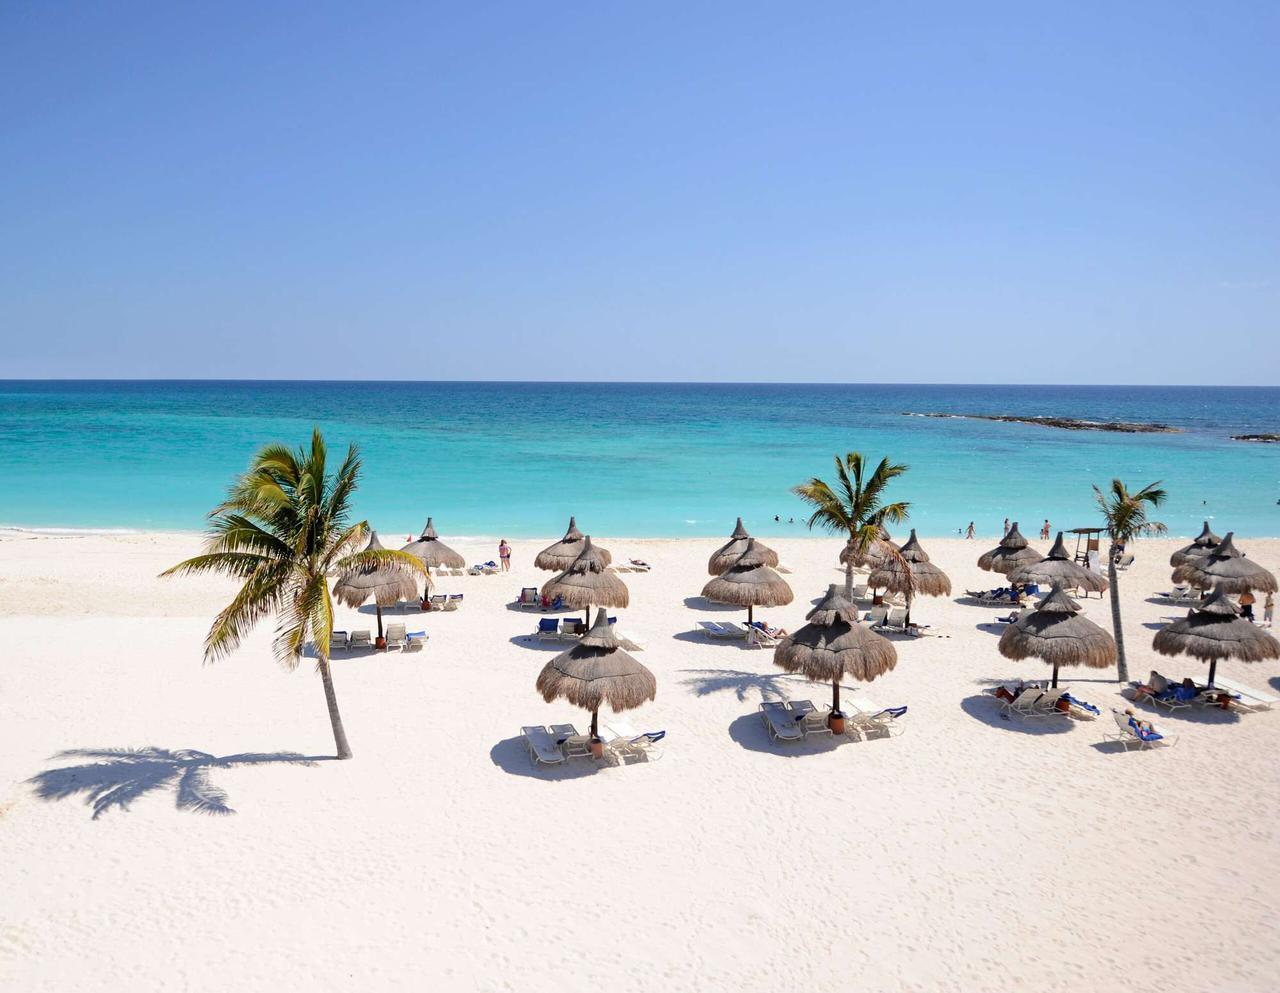 https___ns.clubmed.com_dream_resorts_3t___4t_caraibes_et_cotes_americaines_cancun_yucatan_13594-k3b93t78hm-swhr.jpg